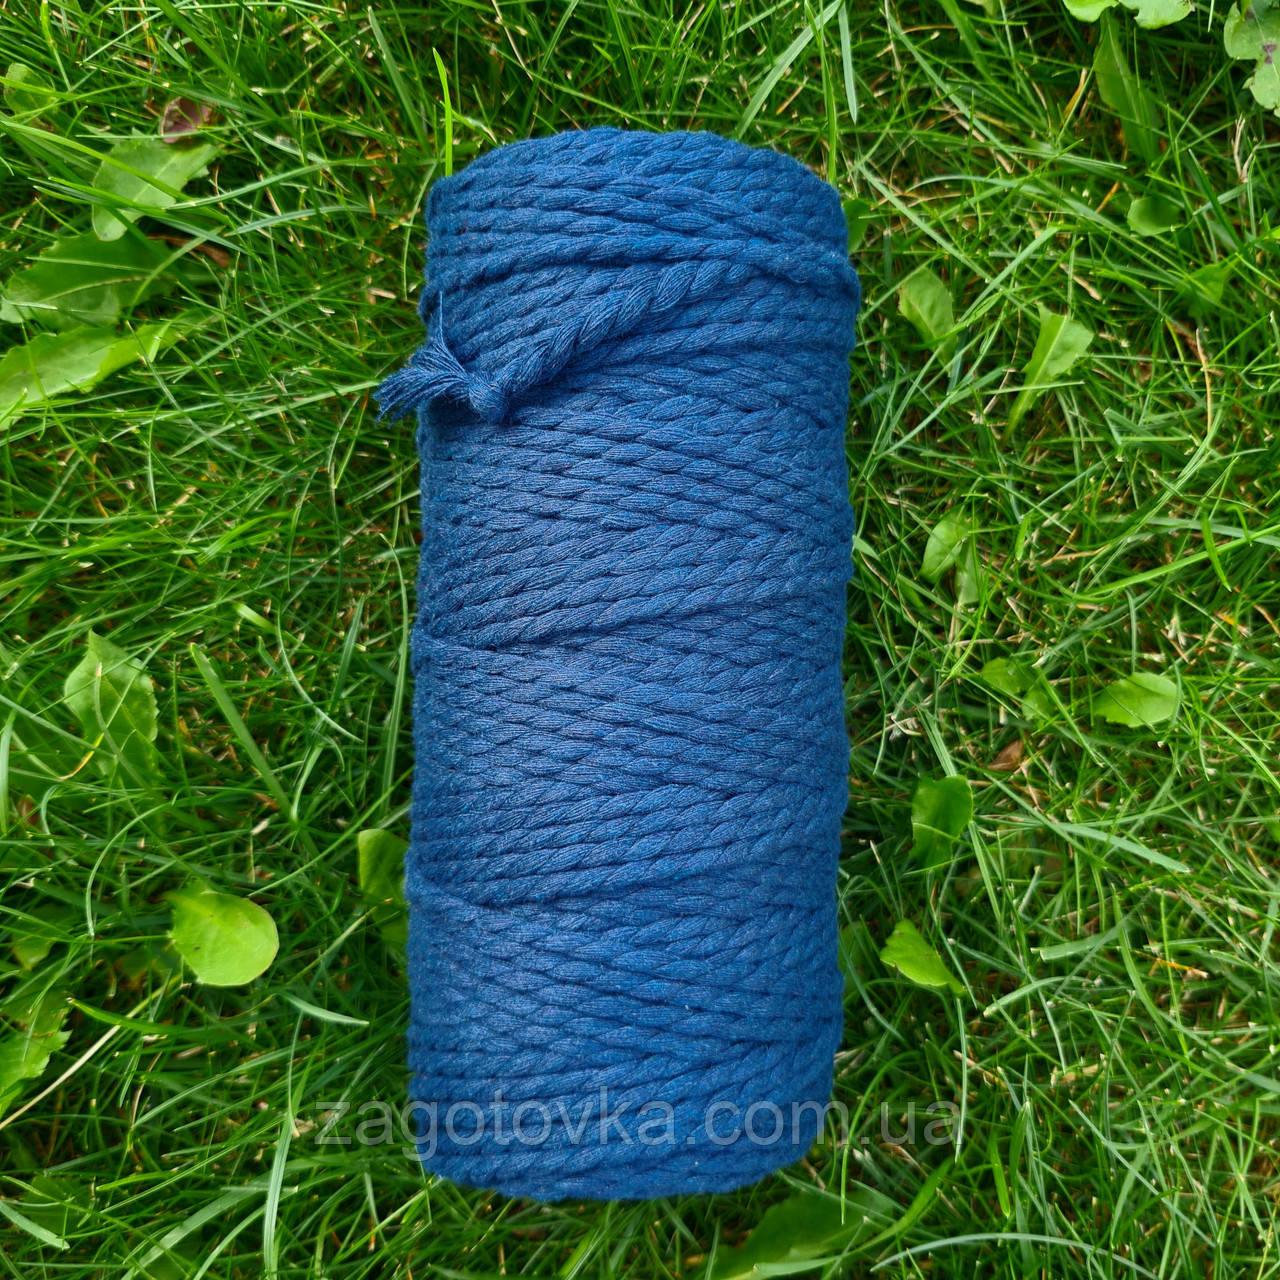 Эко шнур хлопковый крученный 4мм  №19 Лагуна